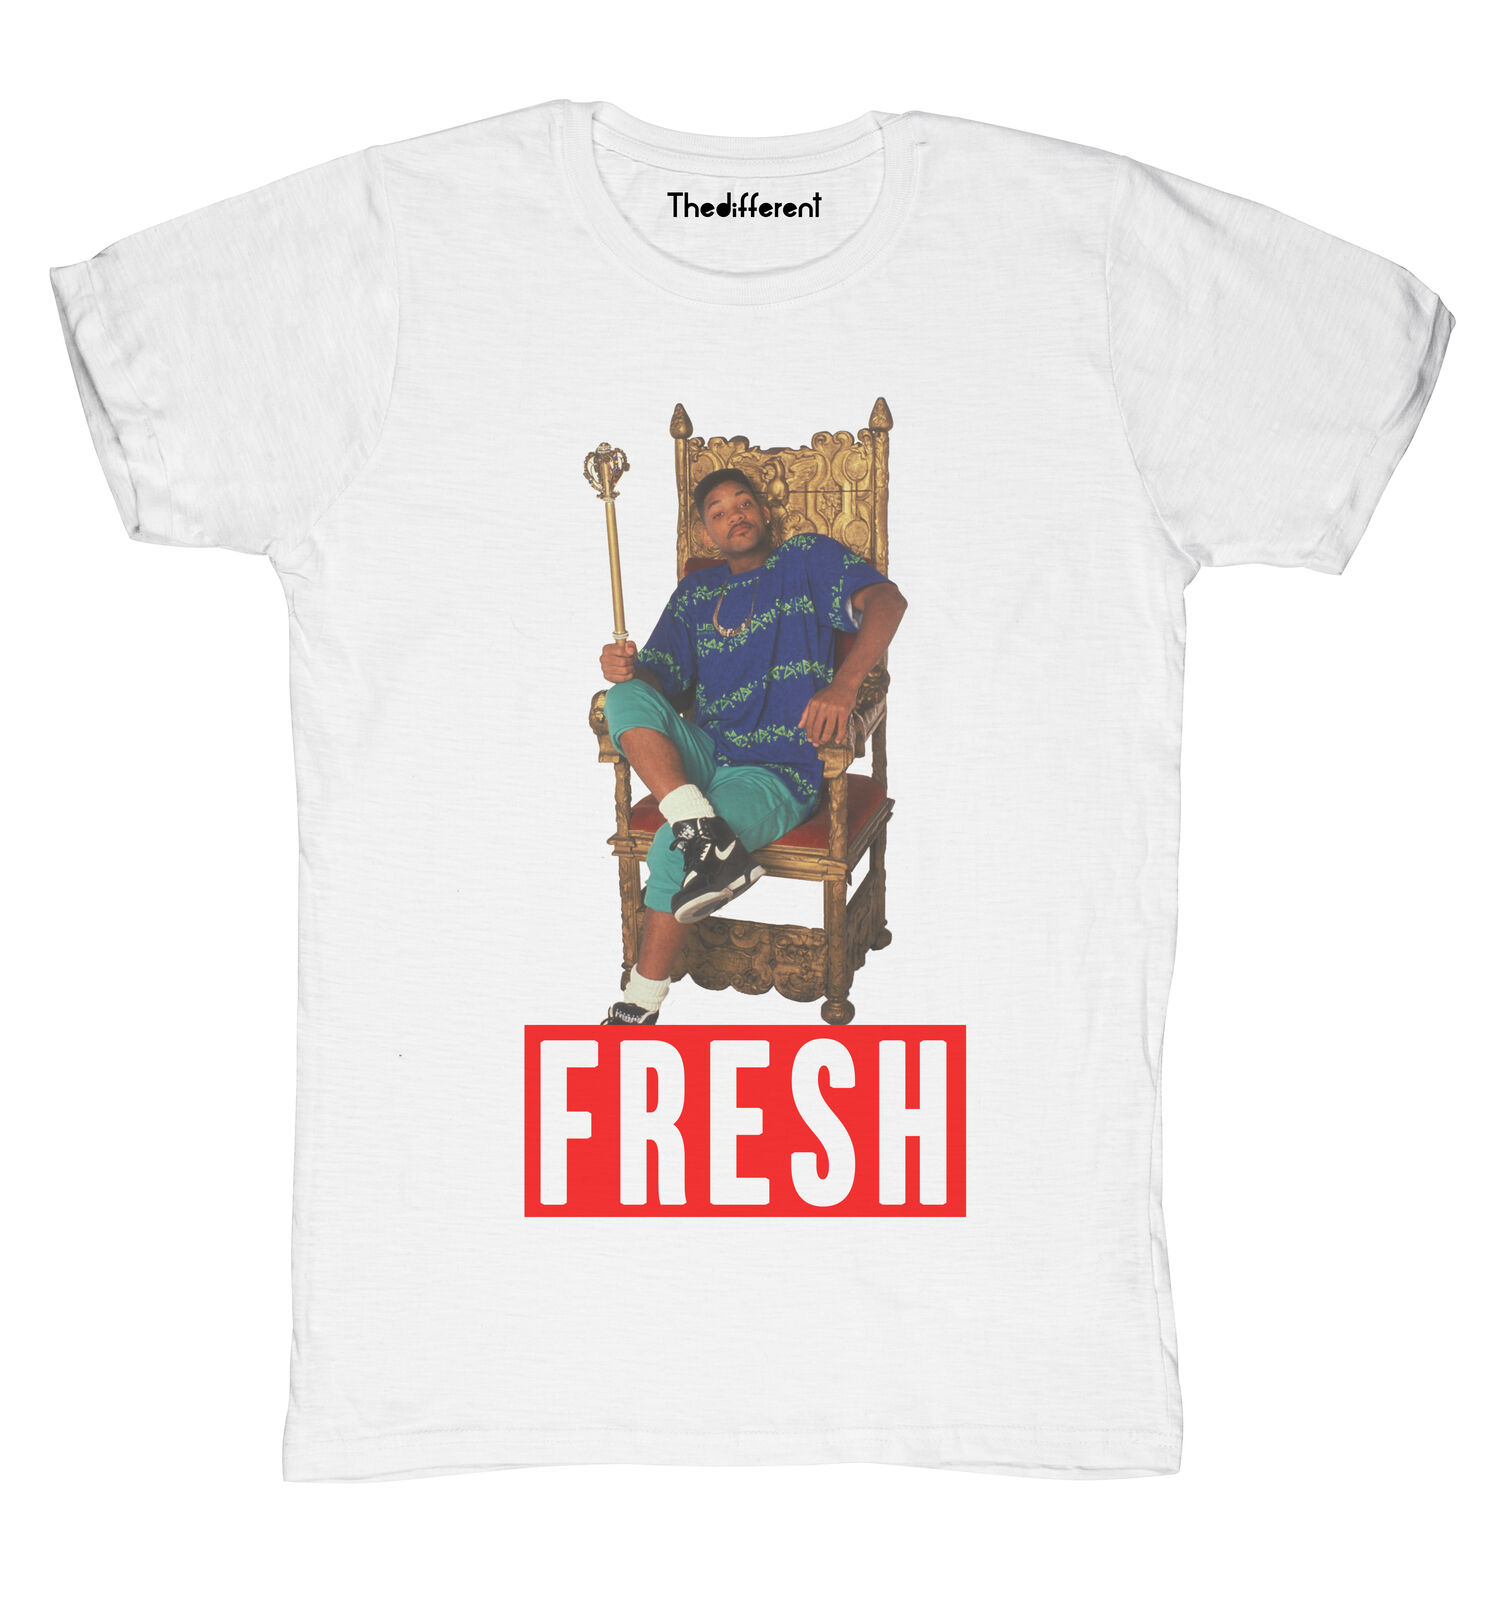 Nueva camiseta Blaze Man Willy Prince Fresh Idea regalo camiseta hombres camisetas divertidas manga corta